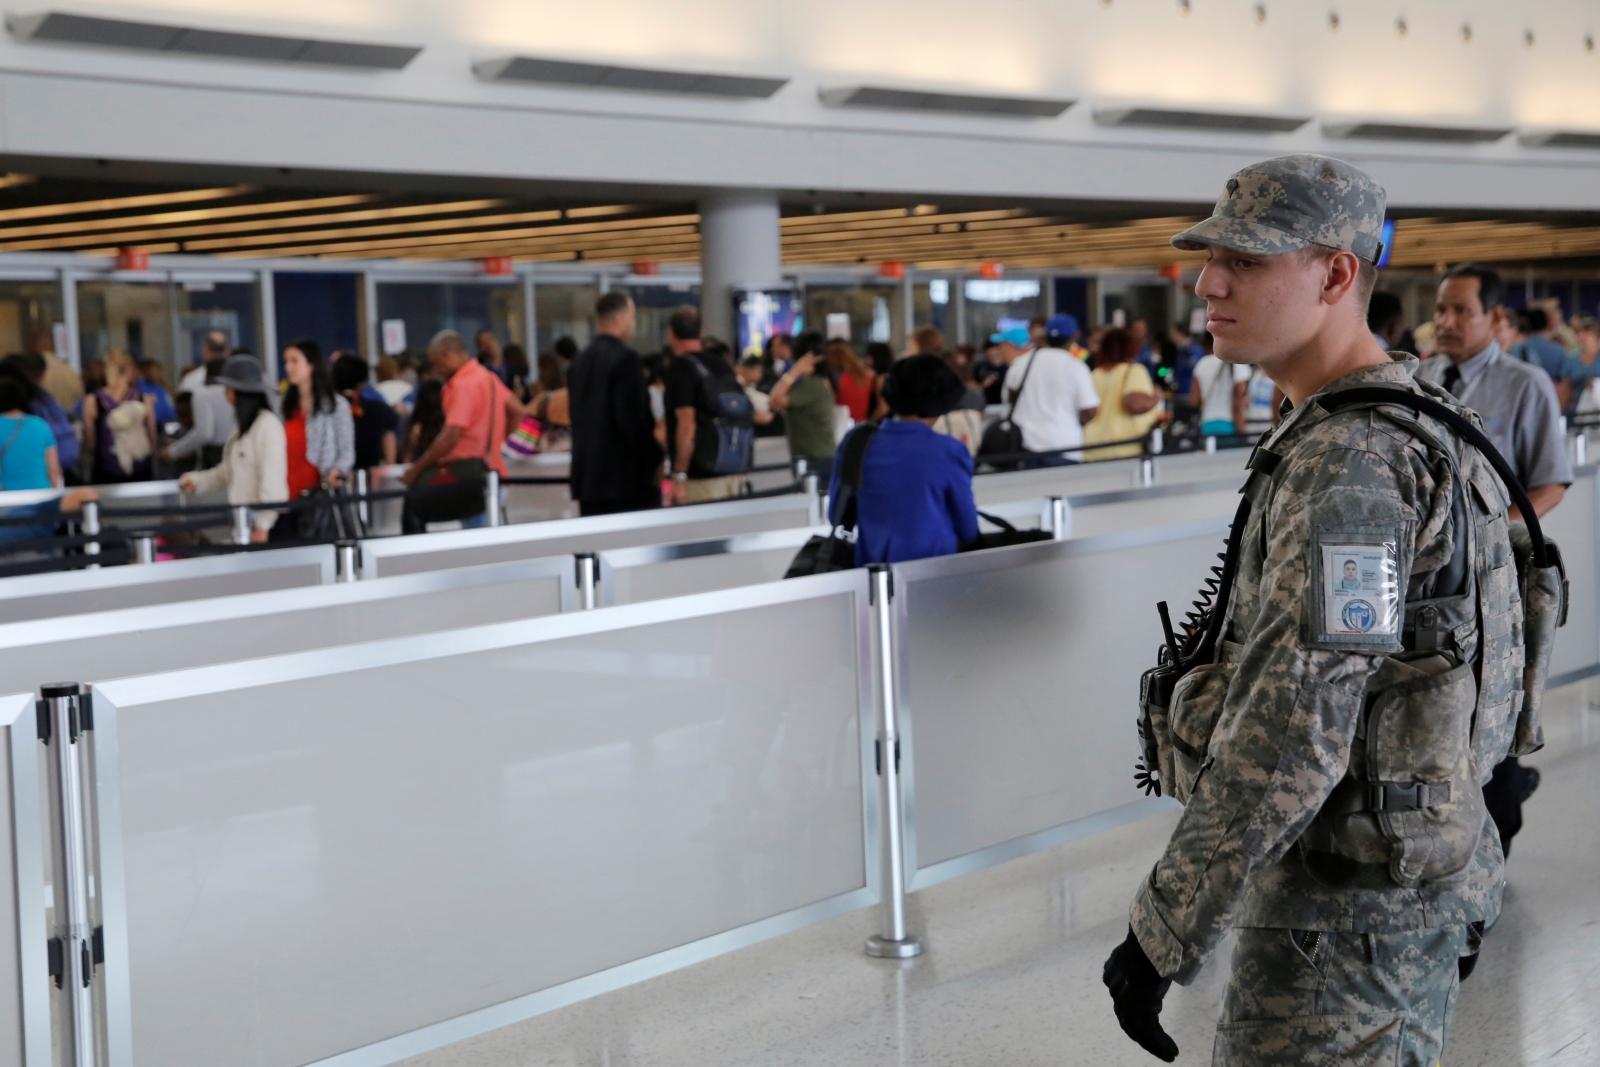 New York JFK airport security